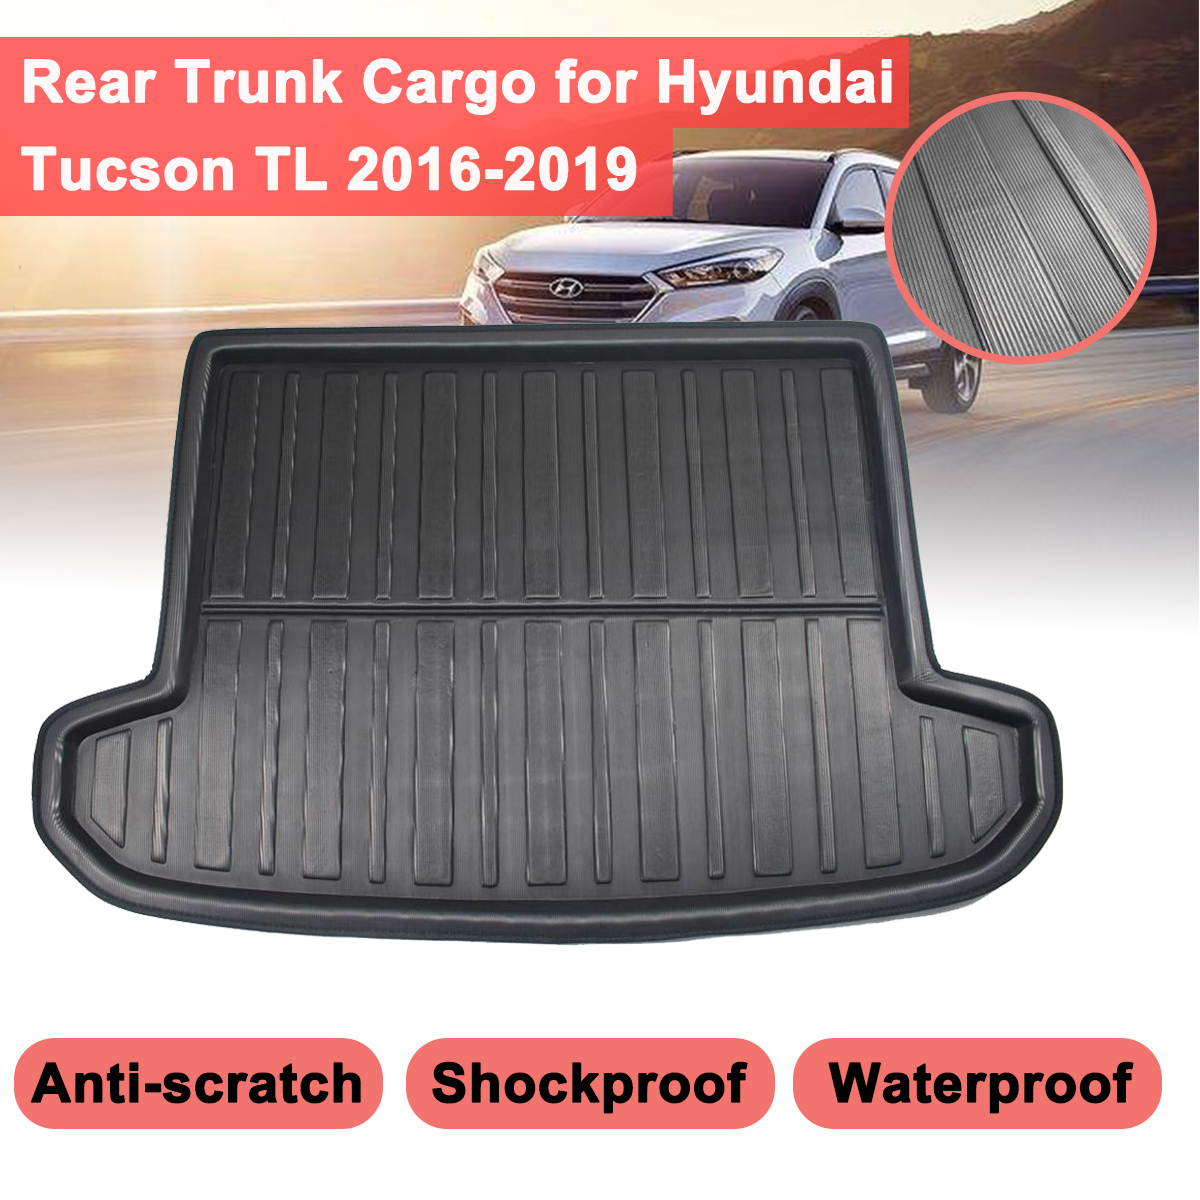 For Hyundai Tucson TL 2019 2018 2017 2016 2015 Car Tray Boot Liner Cargo Rear Trunk Cover Floor Carpet Matt Mat Boot Liner  Mud